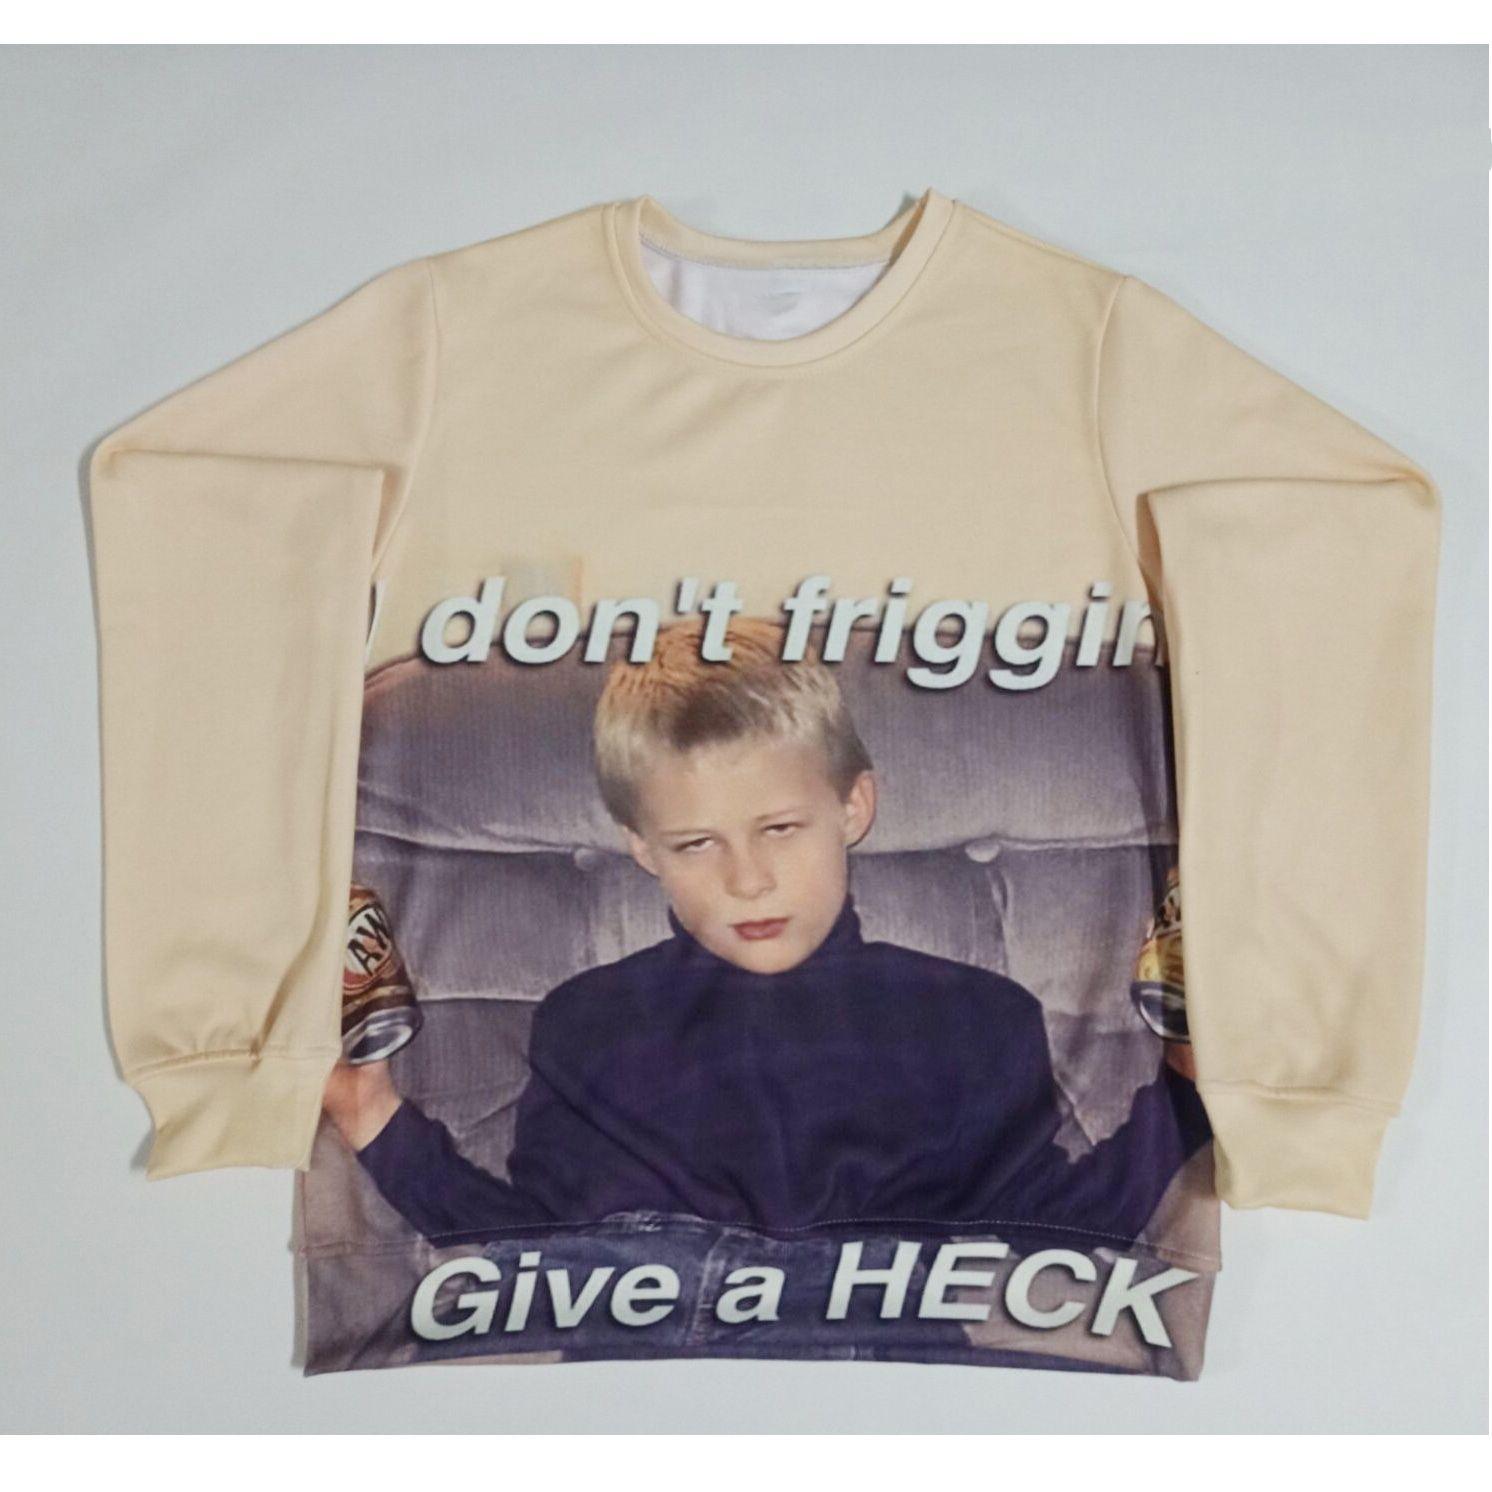 ef625fd3e 2019 Real USA Size I Don'T Friggin 3D Sublimation Printing Sweatshirt  Crewneck Plus Size 3XL 4XL 5XL 6XL From Onlyforfashion, $24.22 | DHgate.Com